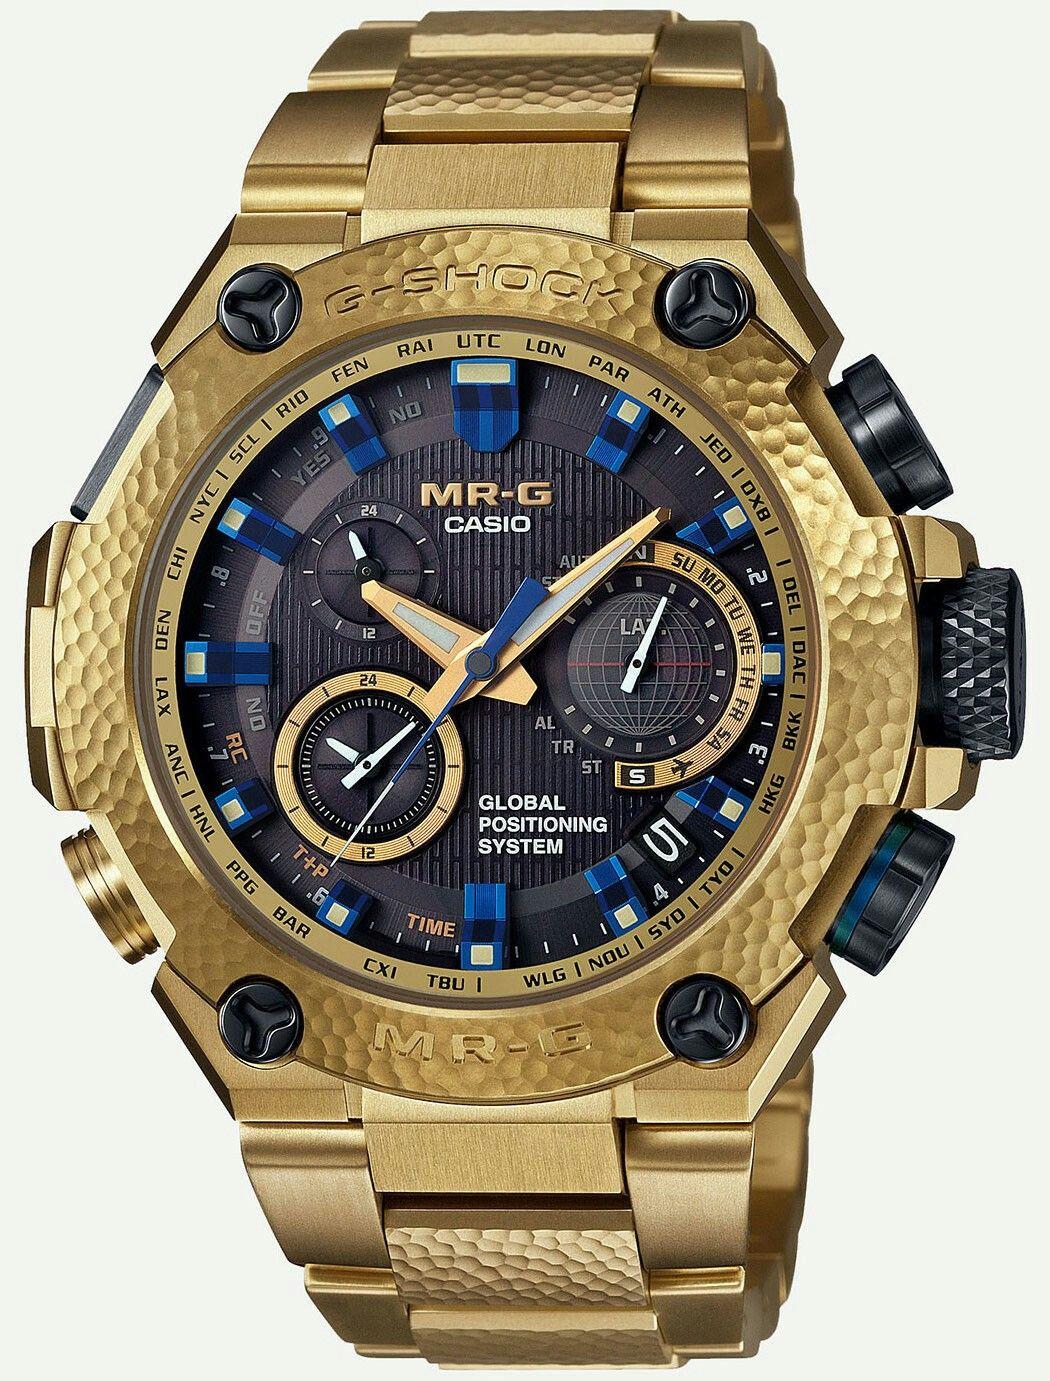 7ceb5b5f294 Casio G-Shock Gold Hammer Tone MRGG1000HG-9A Watch Relojes G-shock